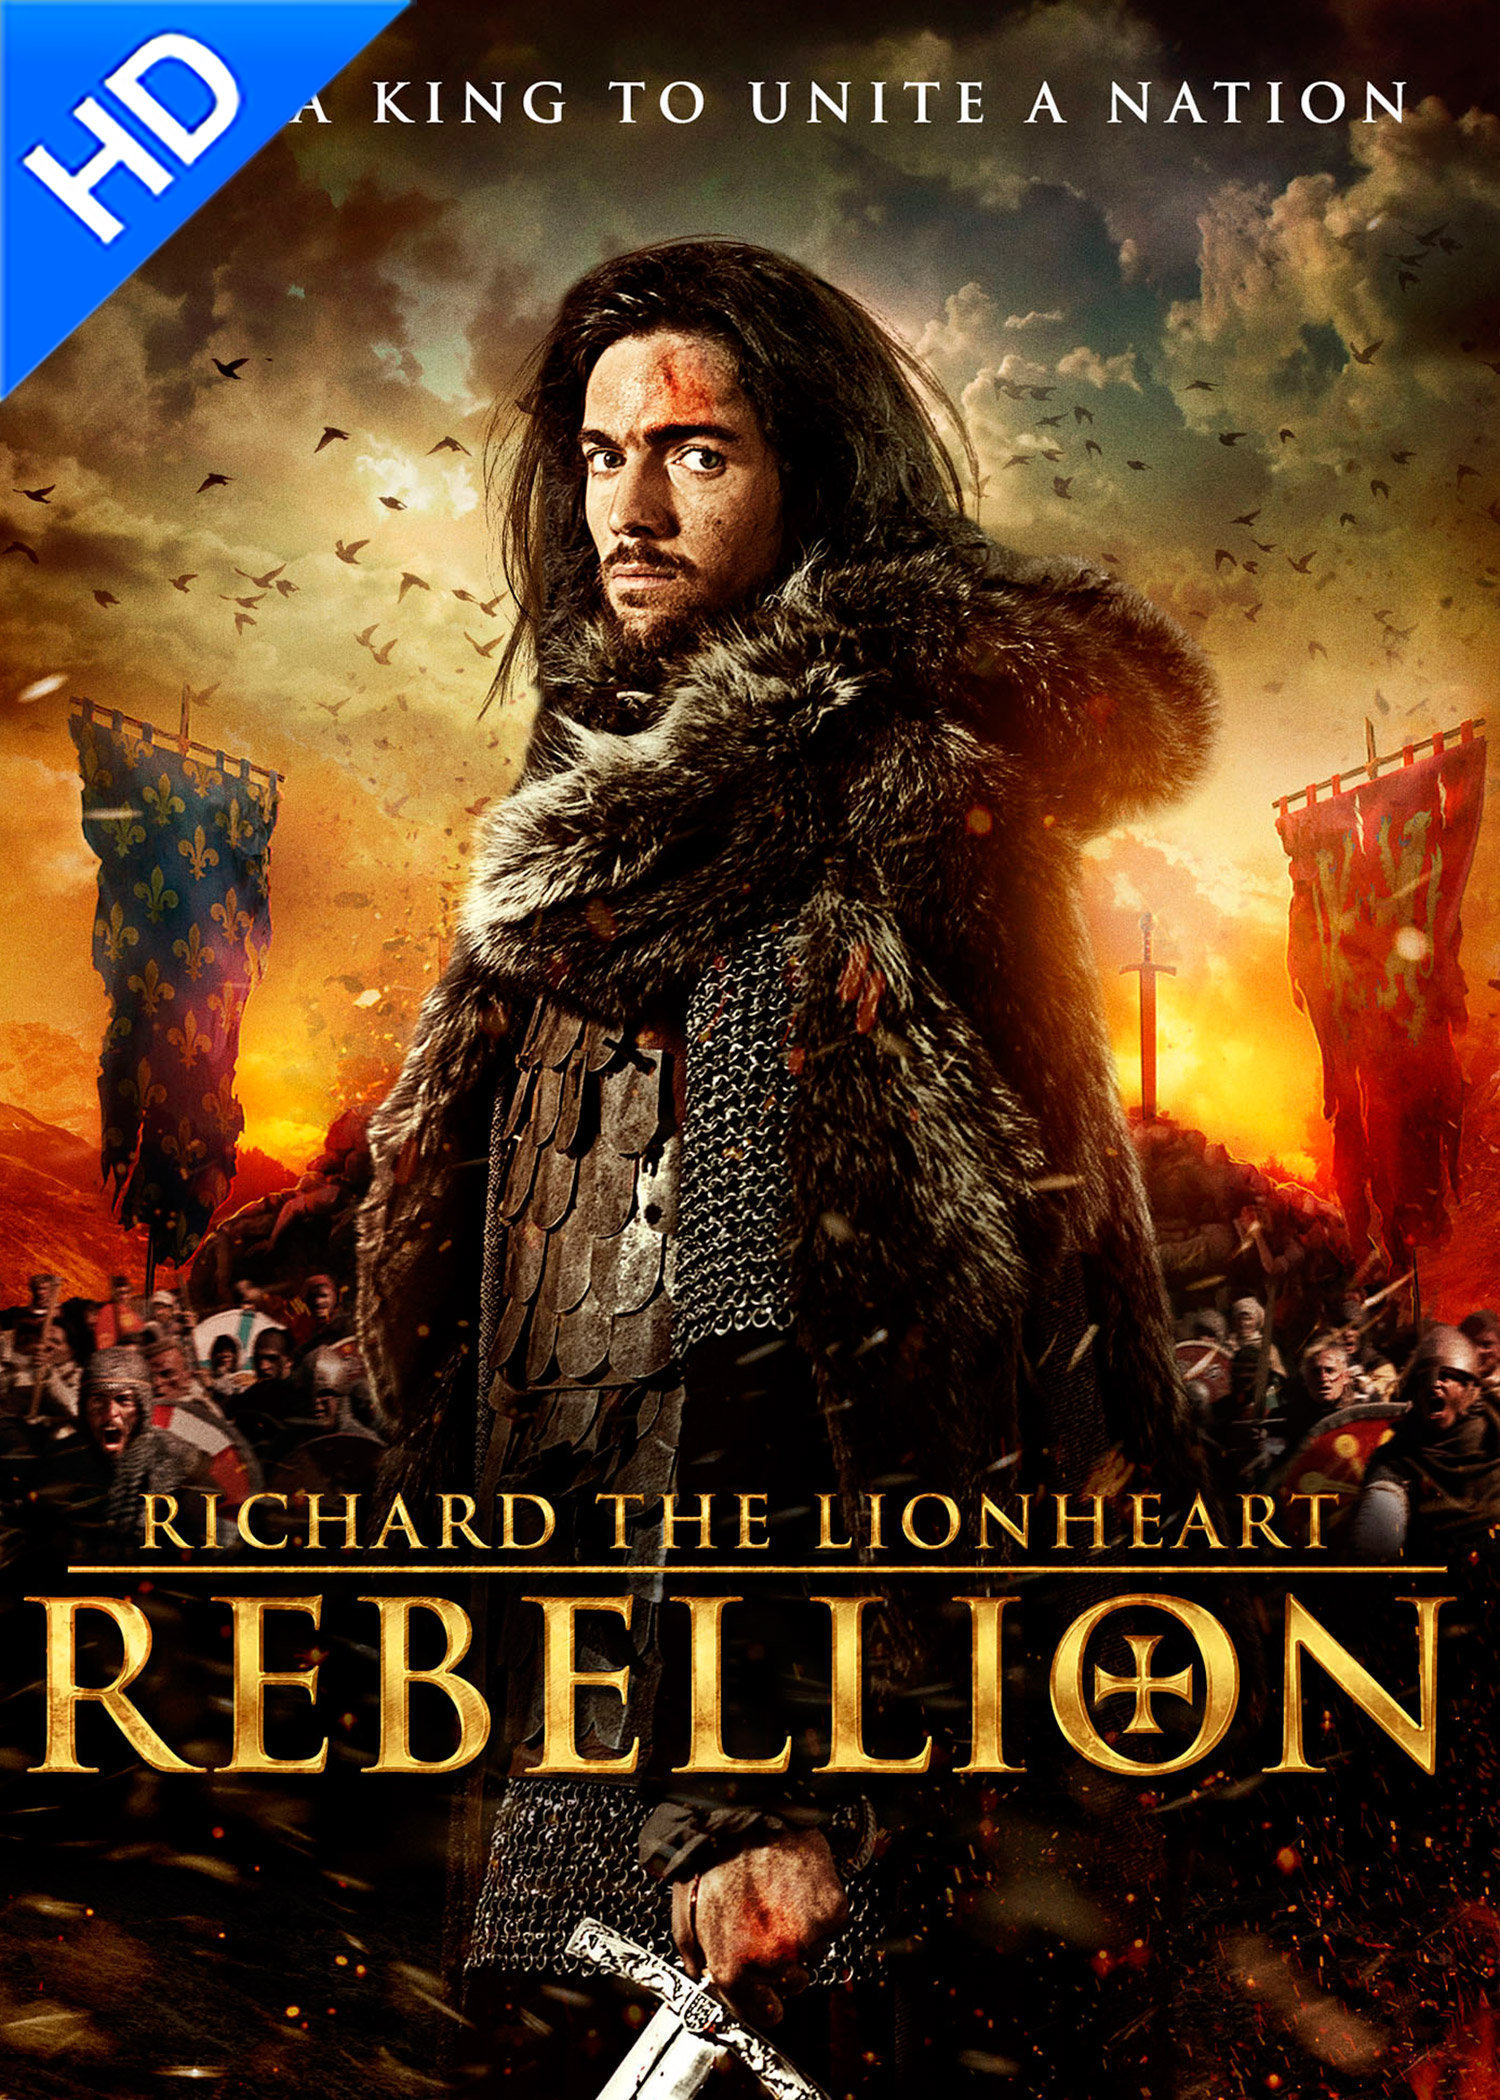 richard-the-lionheart-rebellion